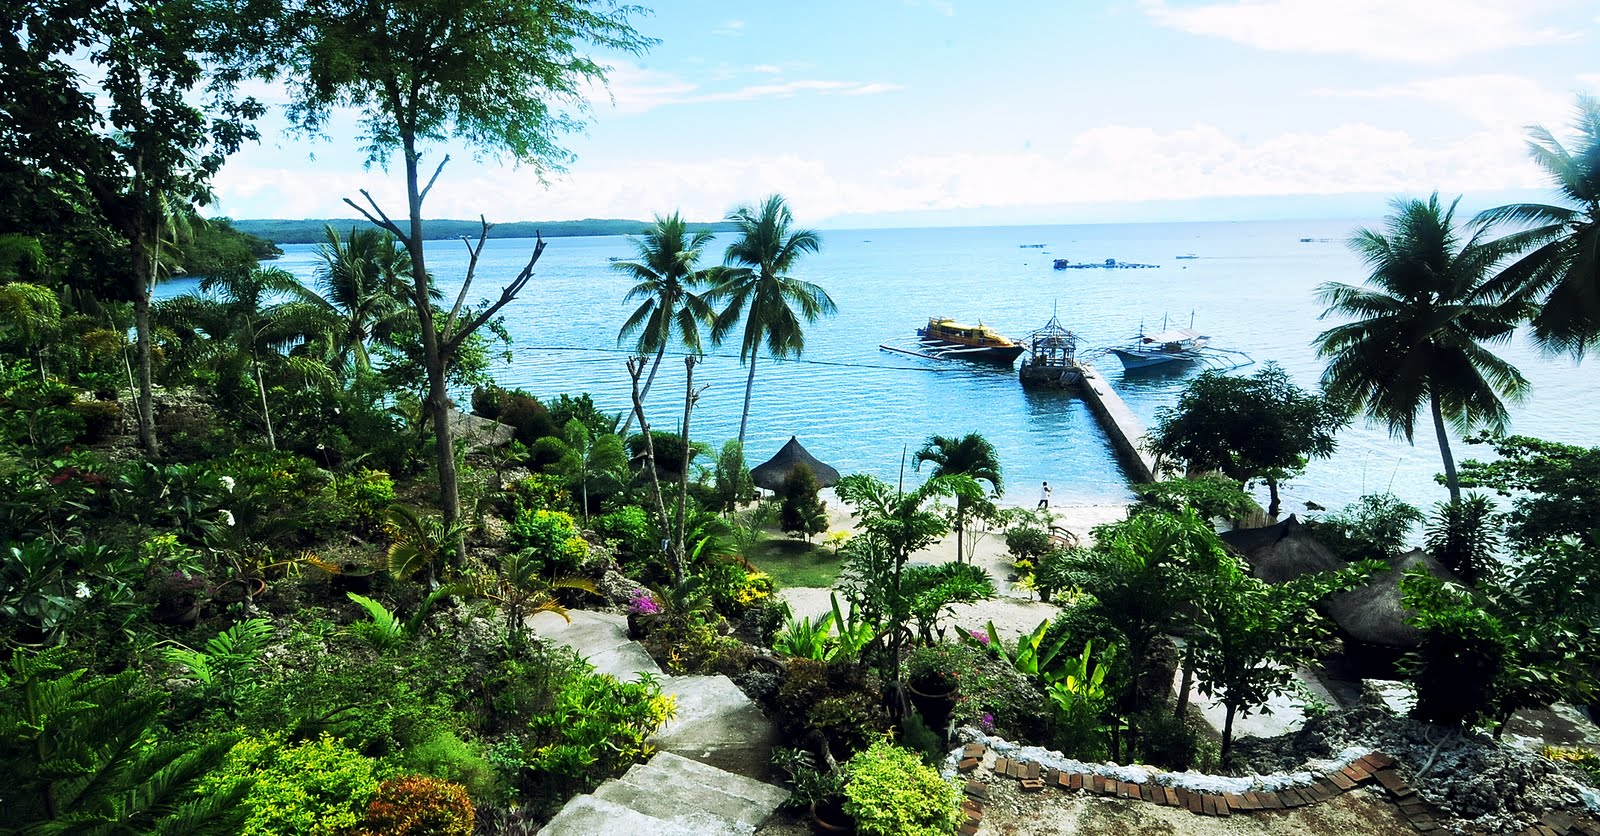 entrance way of isla betita garden and beach resort